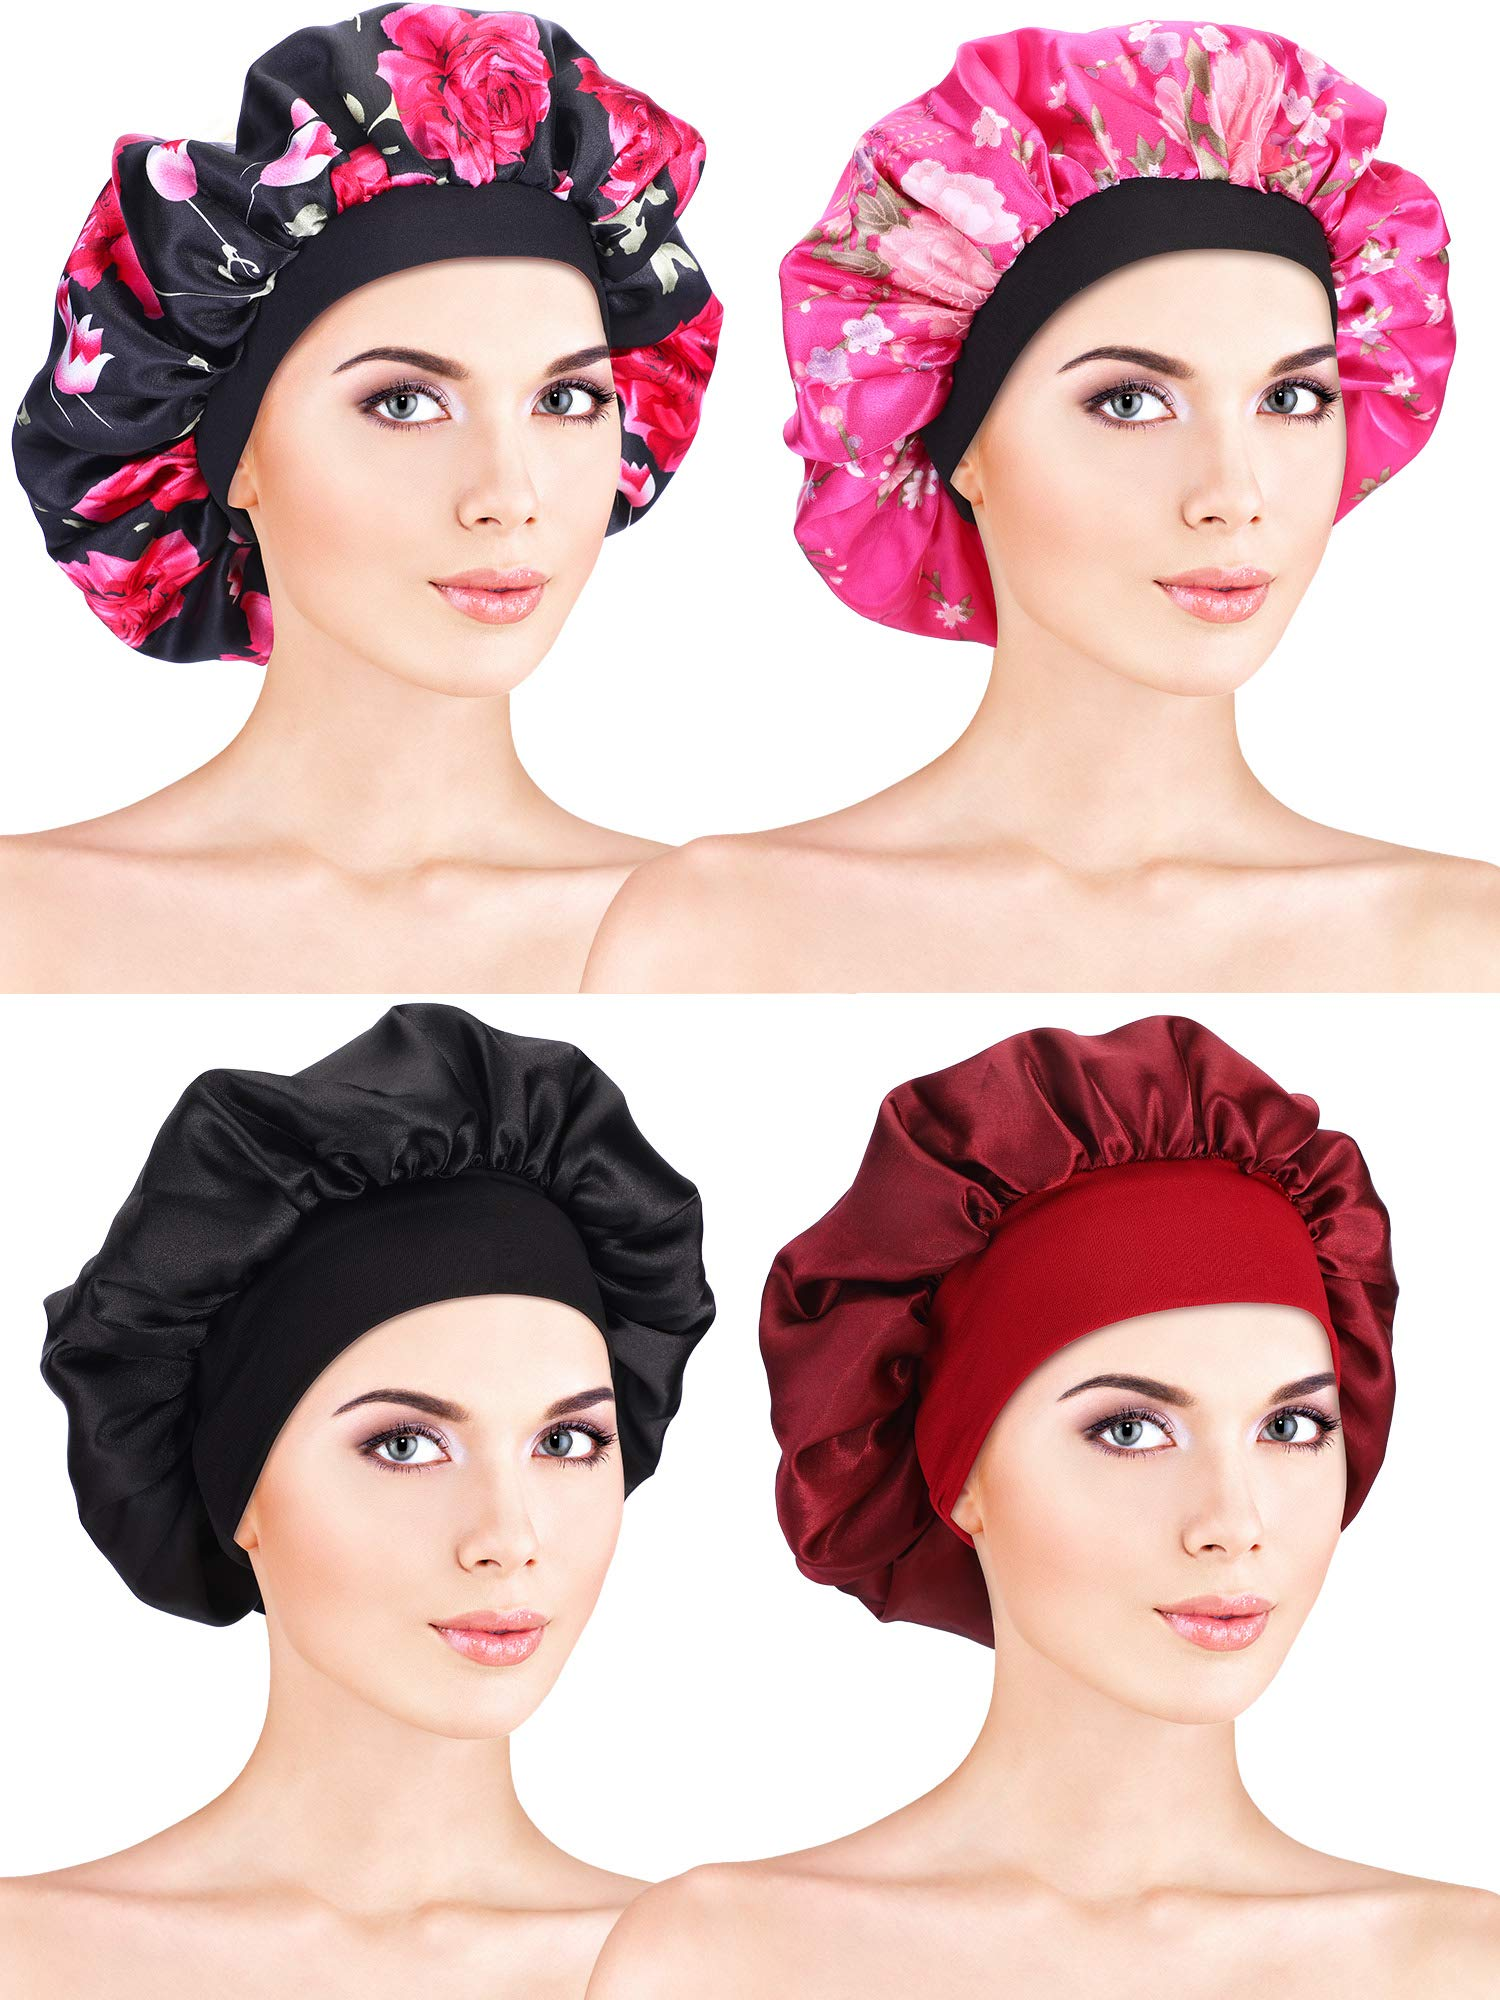 4 Pieces Satin Bonnet Sleeping Cap Soft Night Bonnet Head Cover for Women Girls (Black Flower Printed, Rose Red Flower Printed, Black, Wine Red